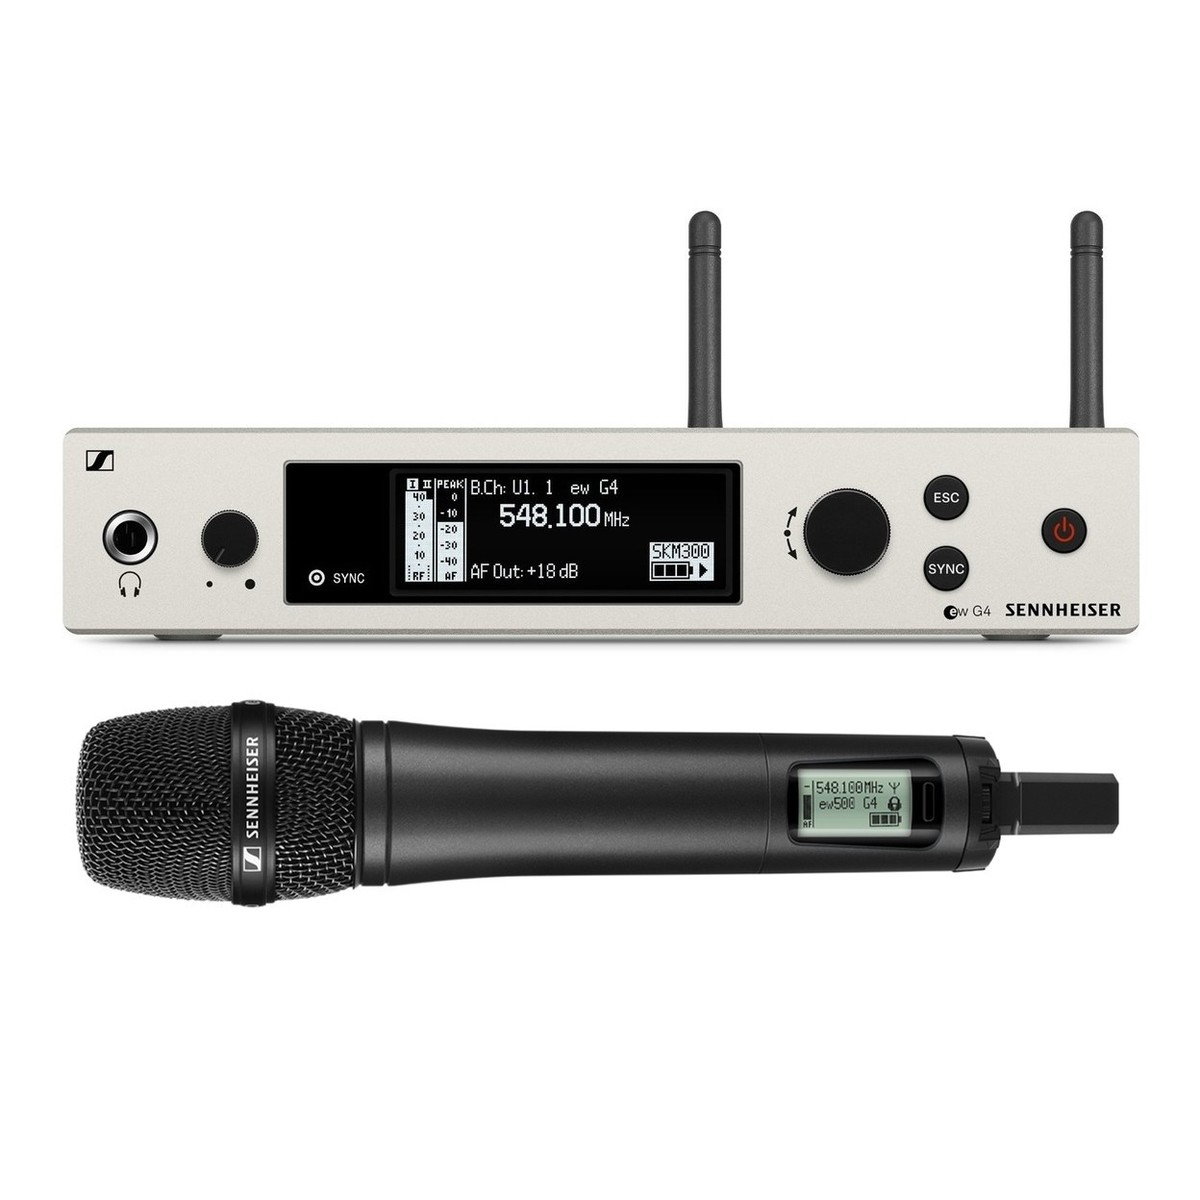 Klangfein Hannover - Sennheiser EW 500-965 | Funkmikrofon | Handheld Mikrofon | AW+ | Messe | Tagung | Mieten